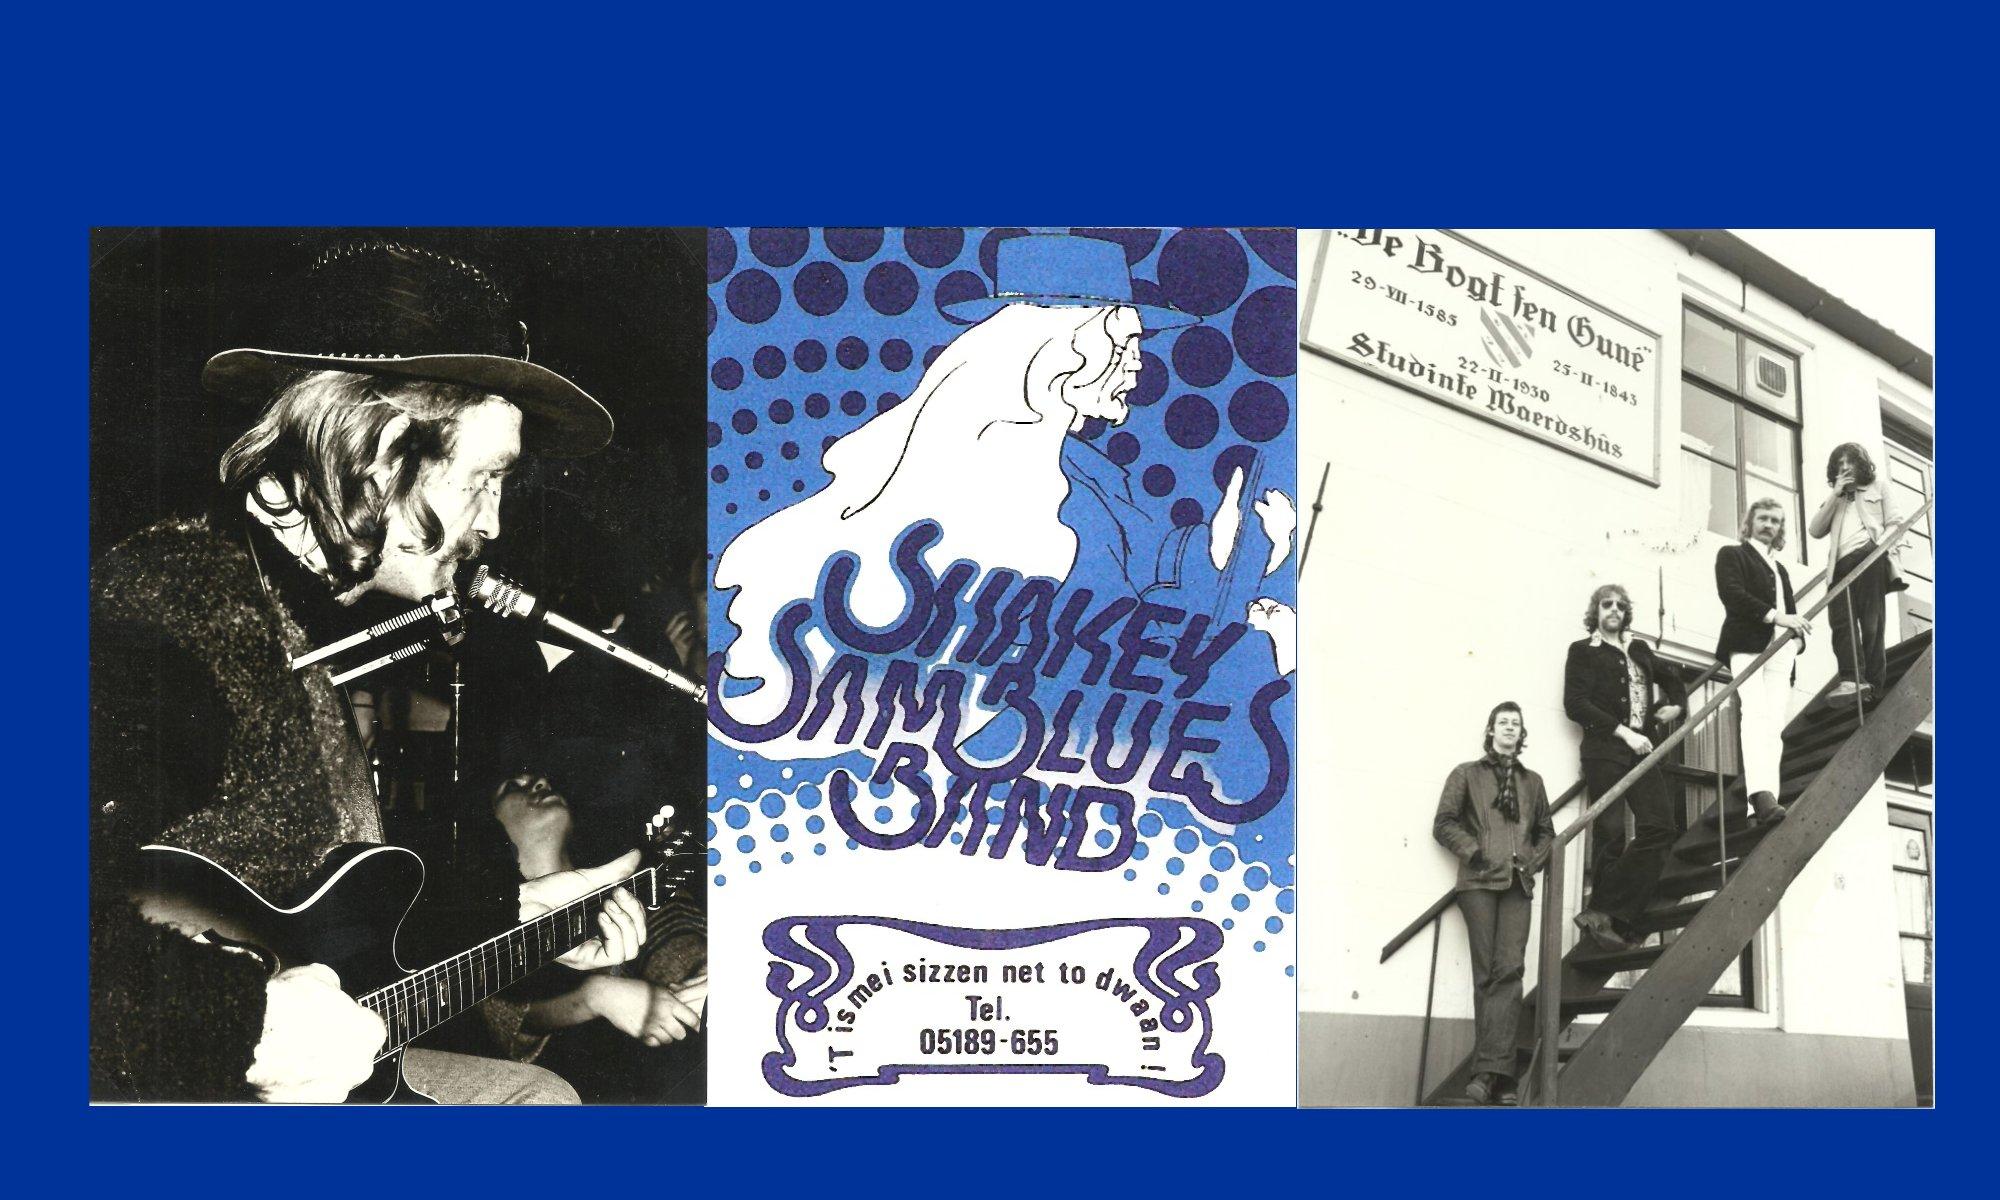 Drieluik Simon-poster-band bogt